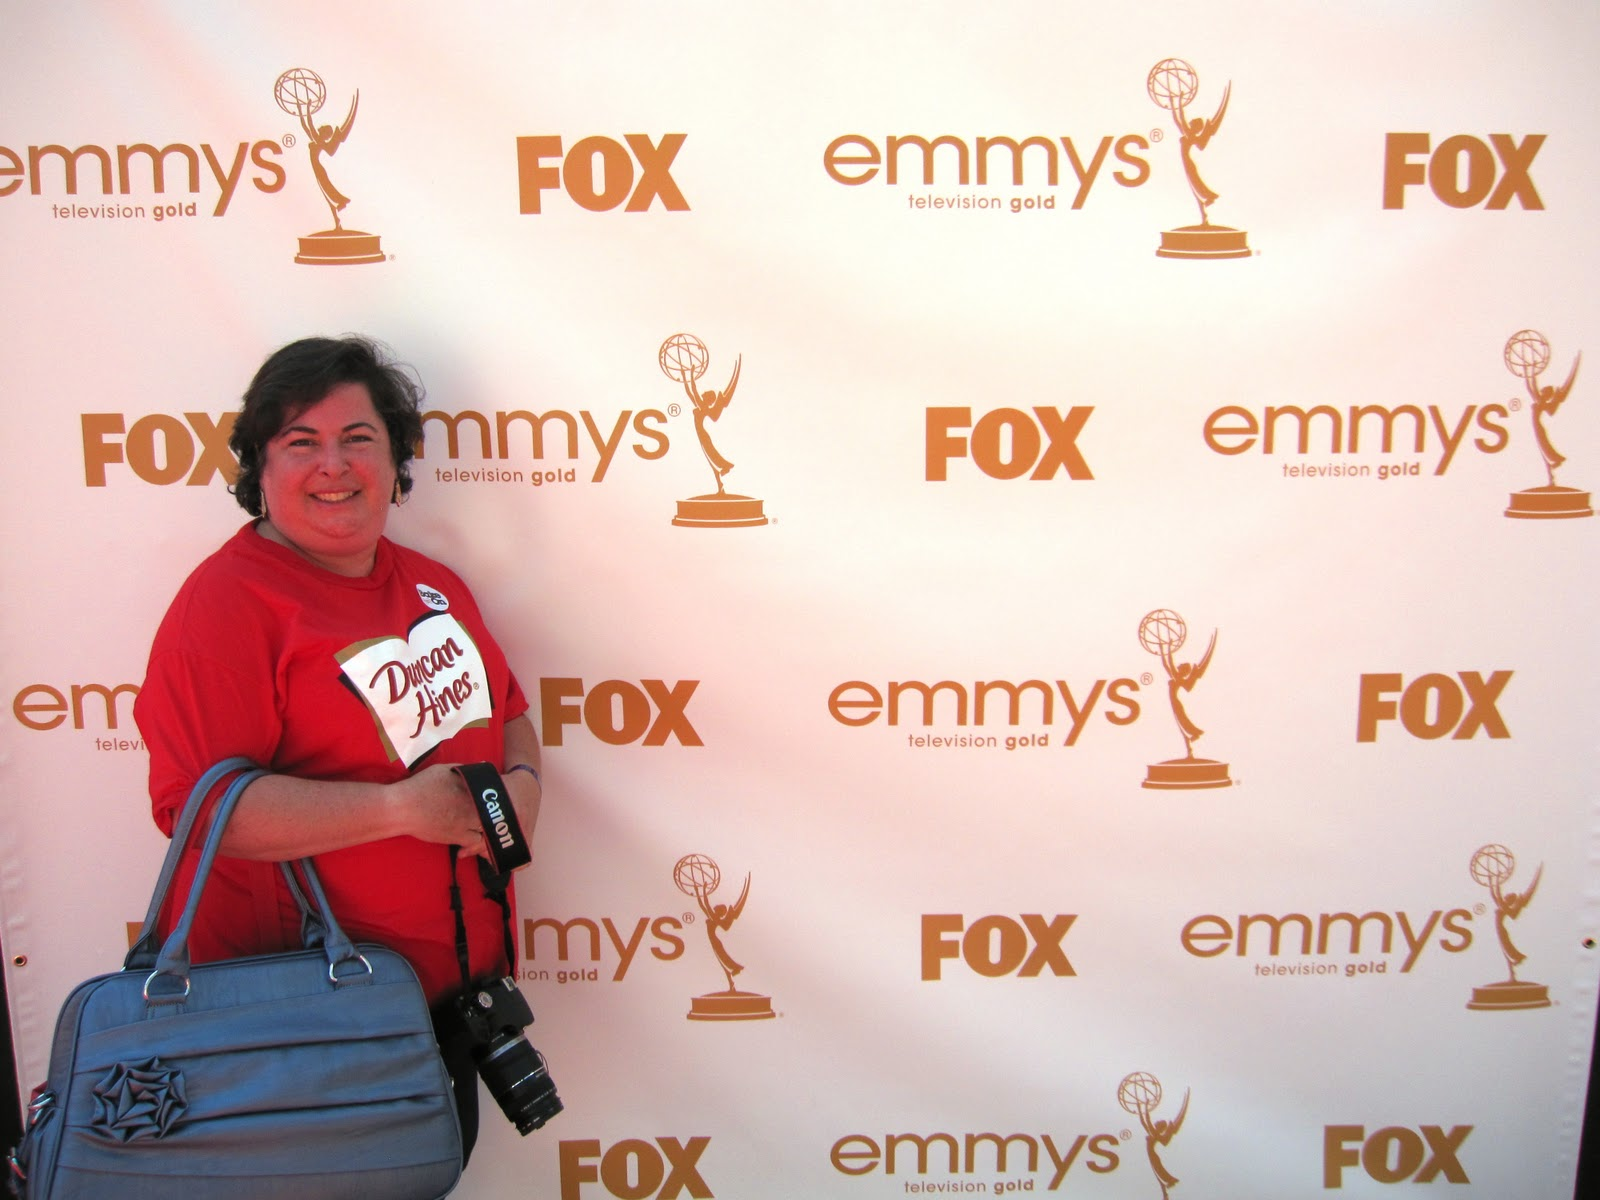 http://2.bp.blogspot.com/-ThVpKWPUeFY/TnbePSk091I/AAAAAAAACXY/OdxYGr8F96o/s1600/Erika+at+the+Emmys.jpg